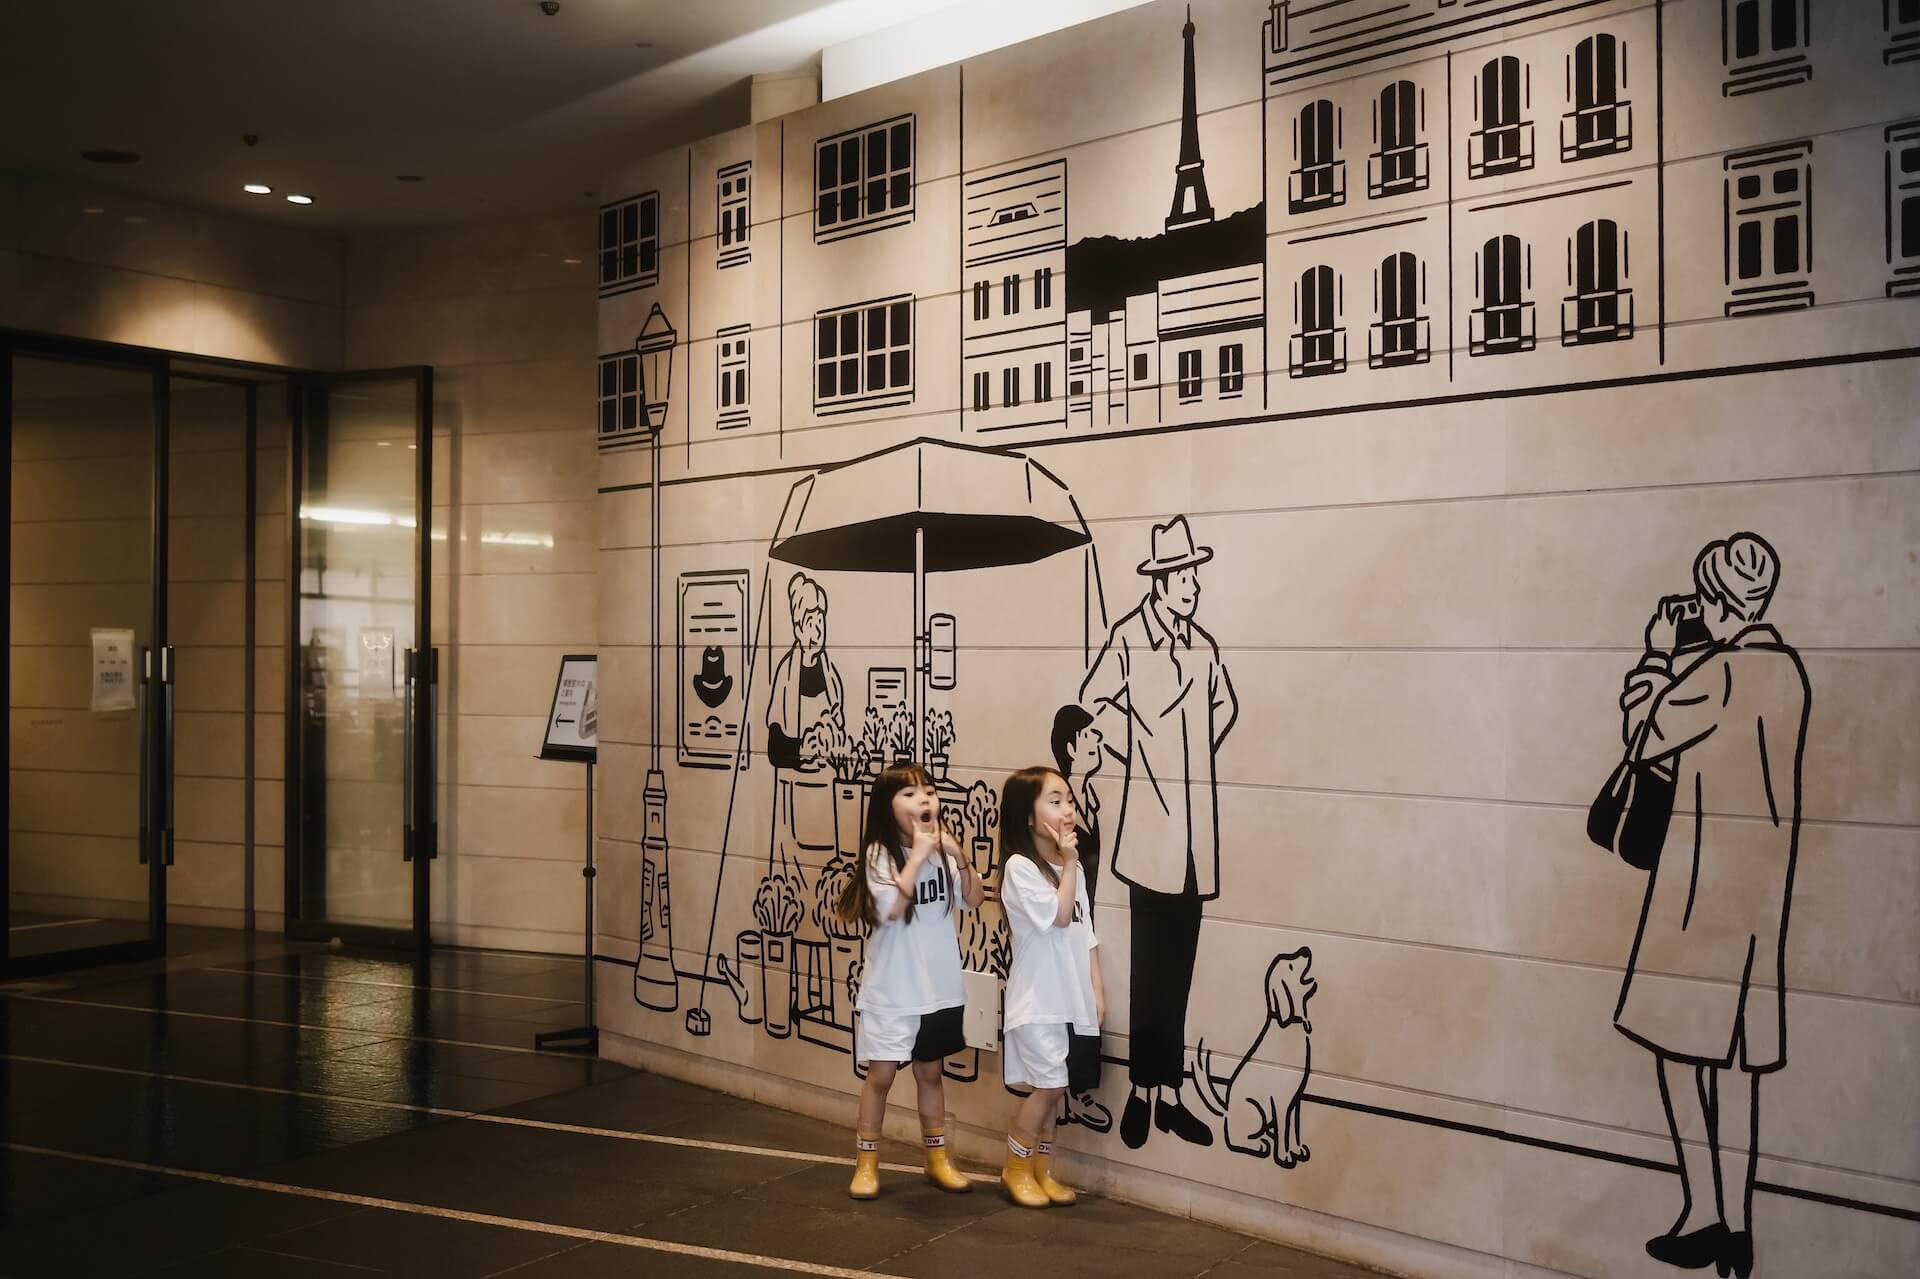 Bunkamuraで、パリを訪れた気分に ー MAPP_ × 伊藤敦志 『PLAYTIME』に込めた想い interview210715_mapp-ito-atsushi-01